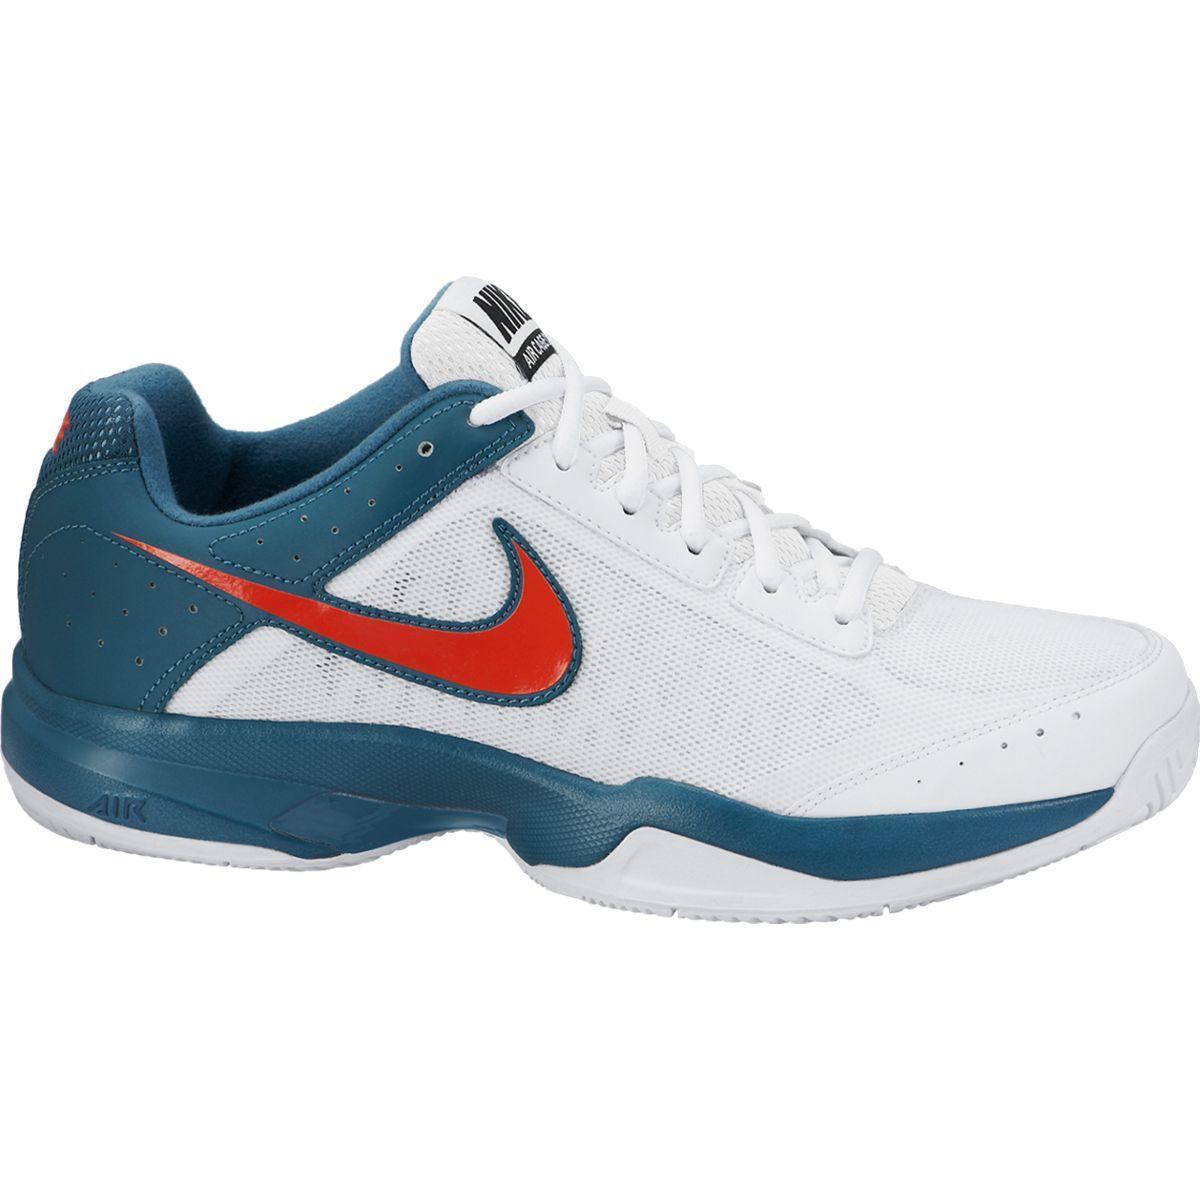 100% authentic 0a131 fdcfc Nike Mens Air Cage Court Tennis Shoes - White Blue - Tennisnuts.com